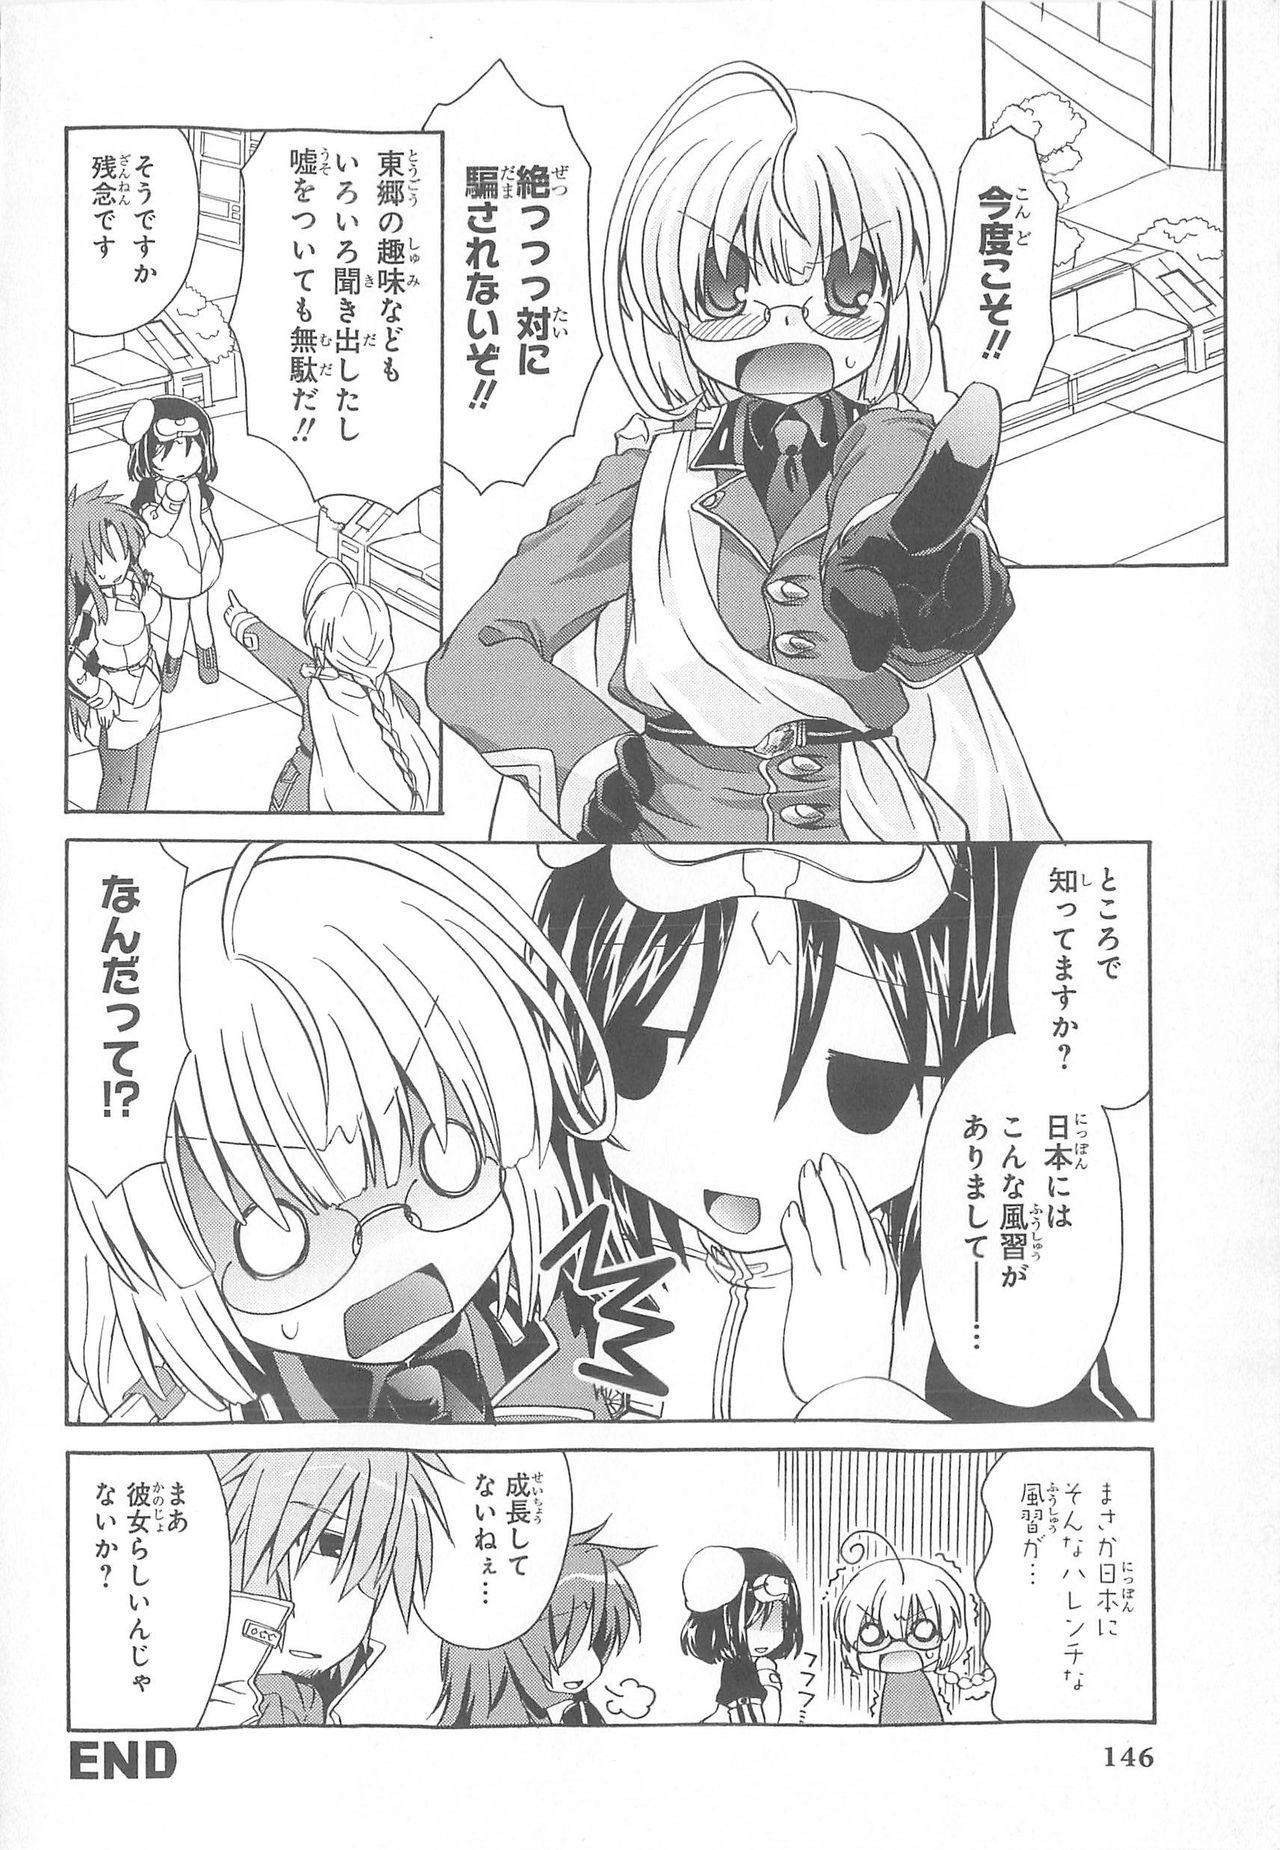 Daiteikoku comic Anthology vol.2 146